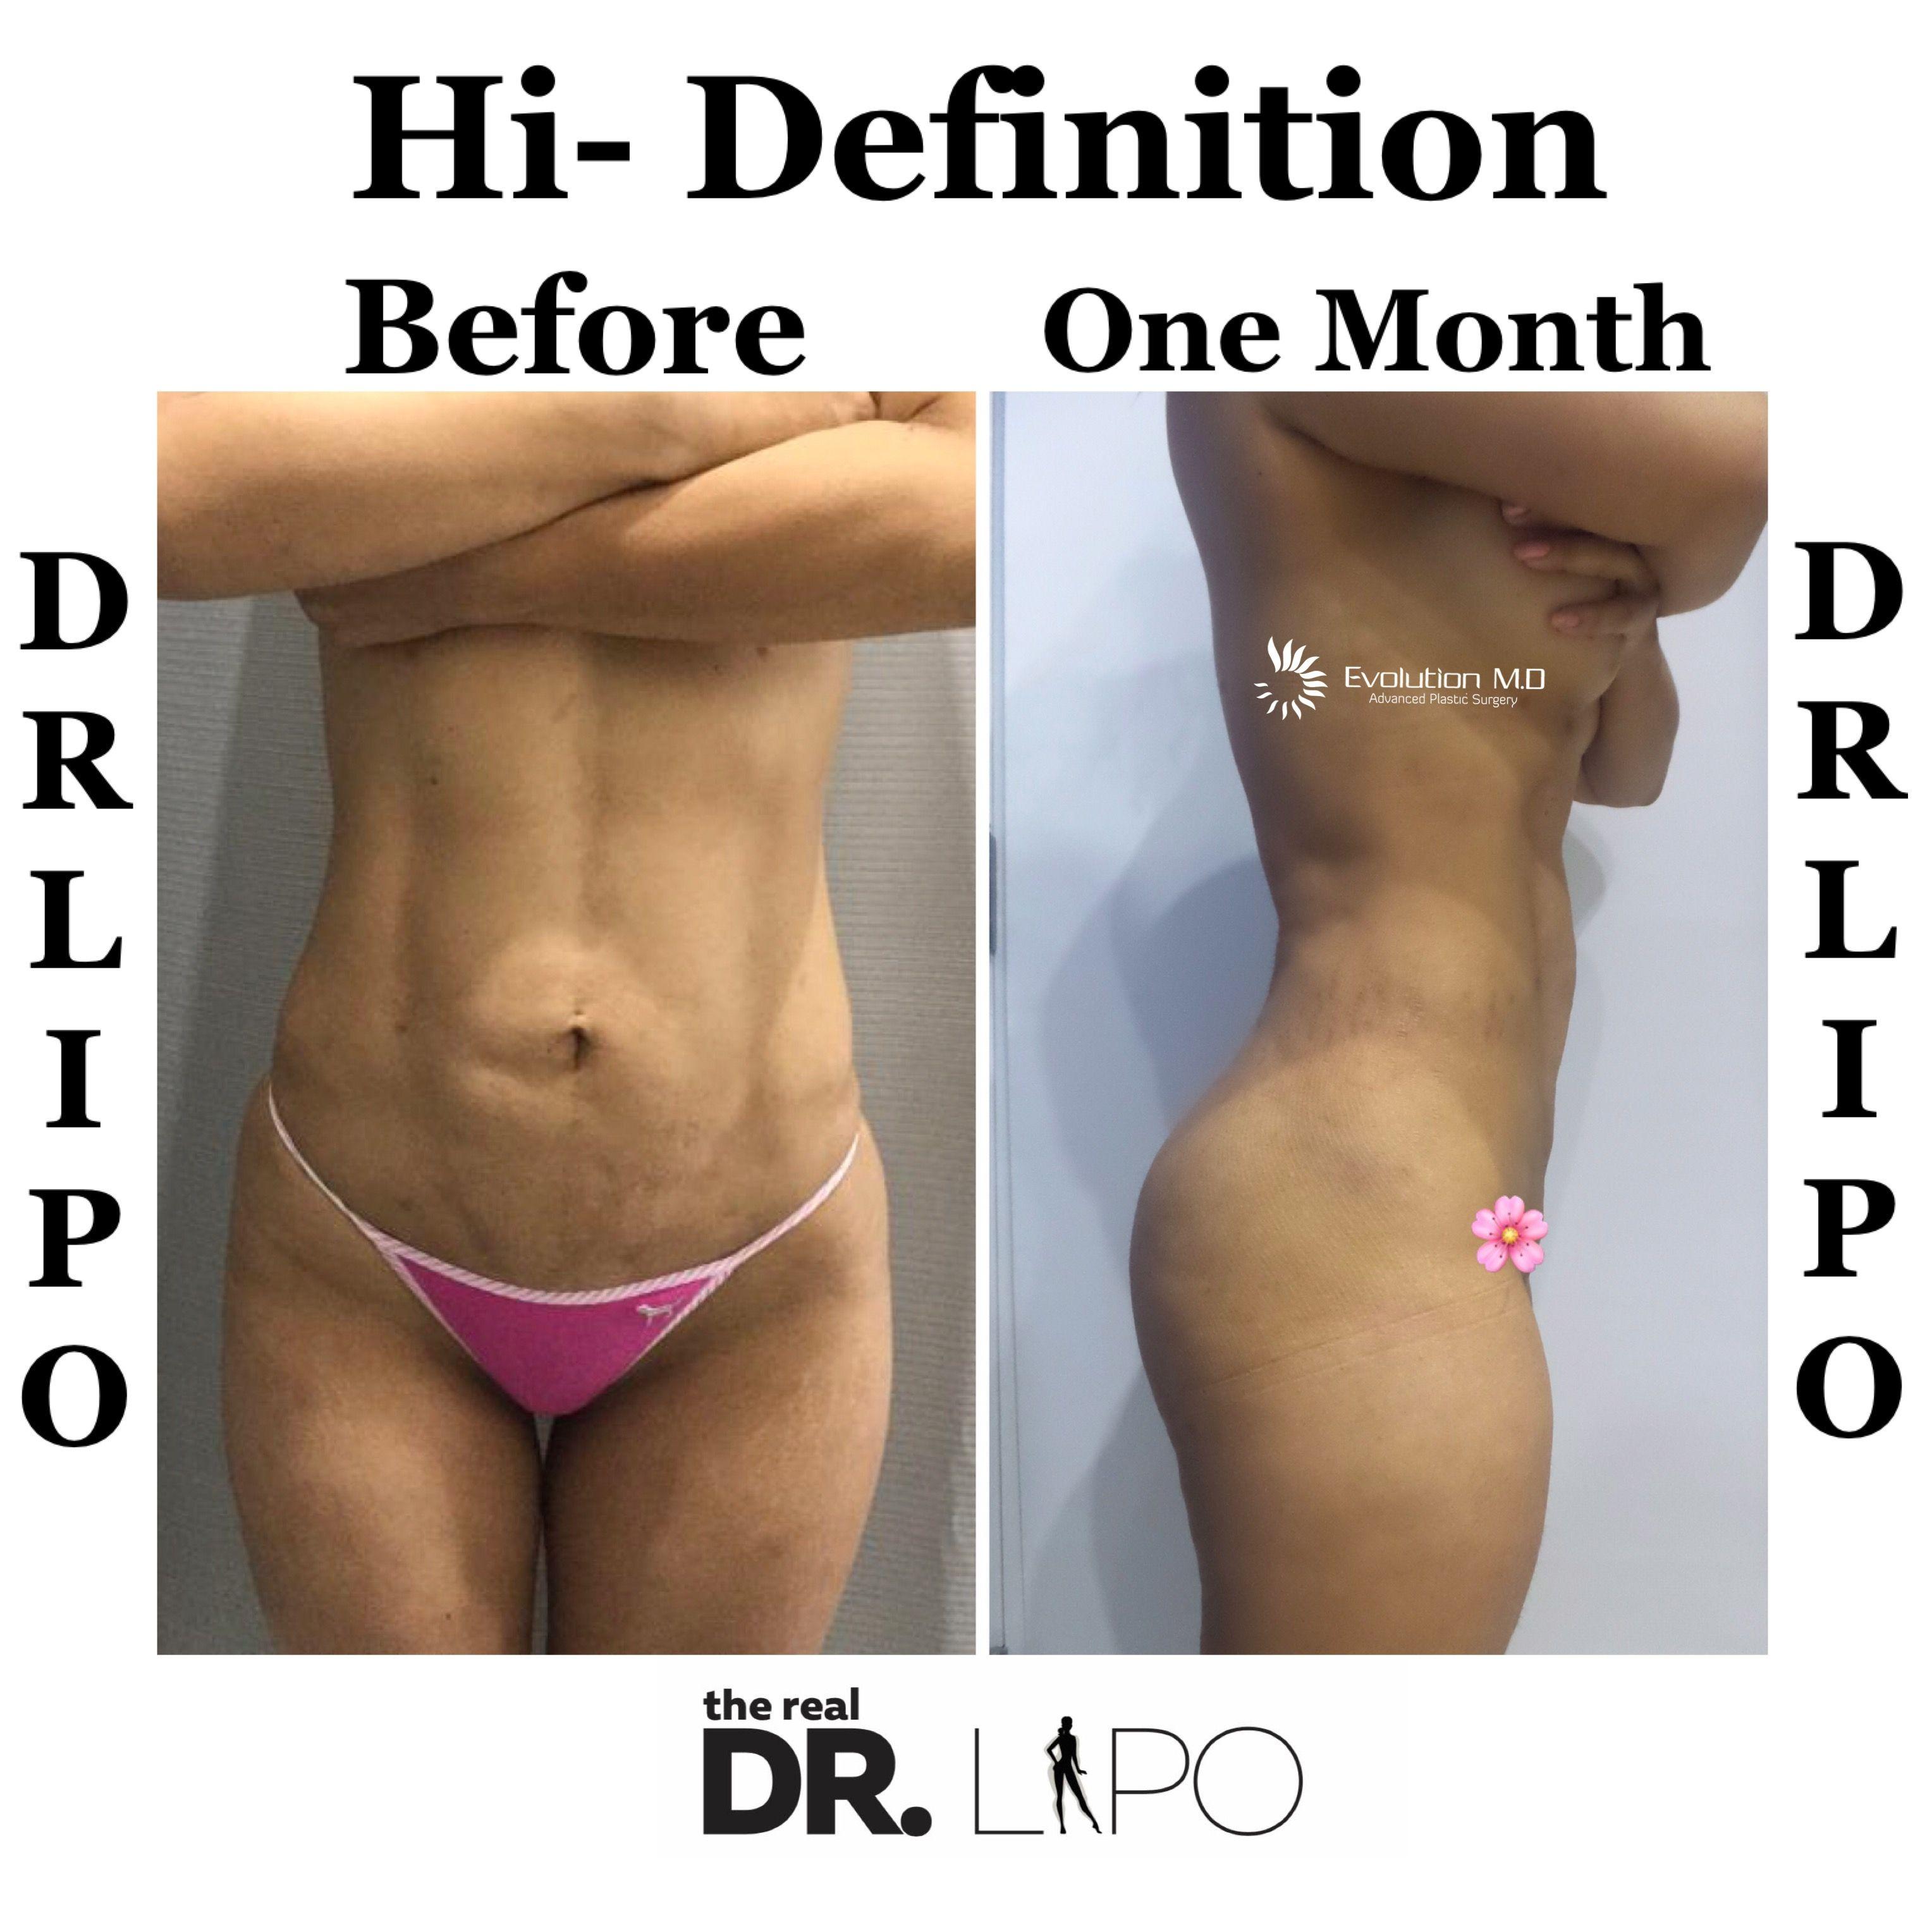 Pin on Liposuction